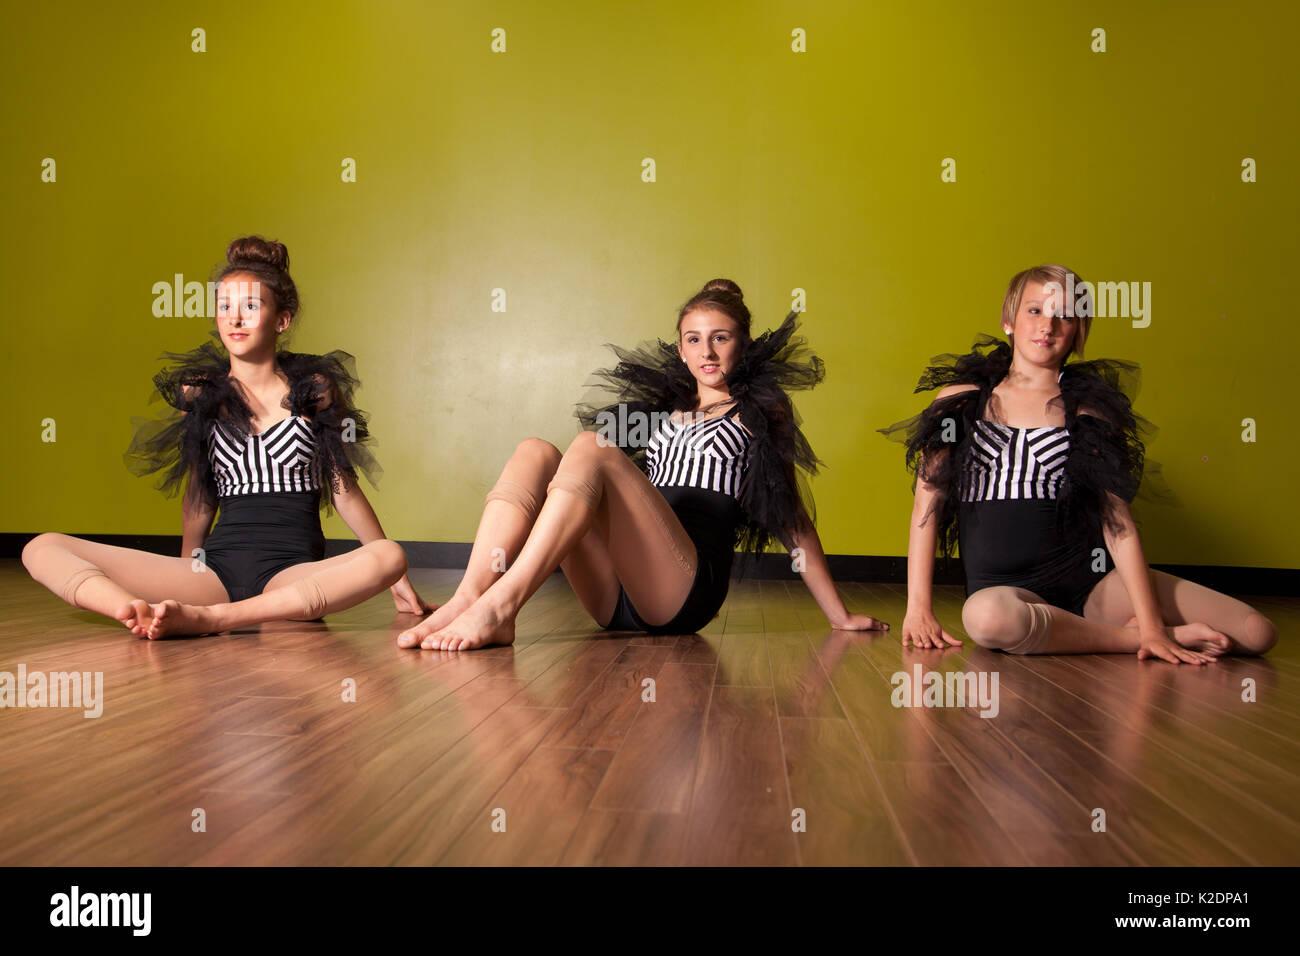 Three teenage models and dancers in costumes pose in studio